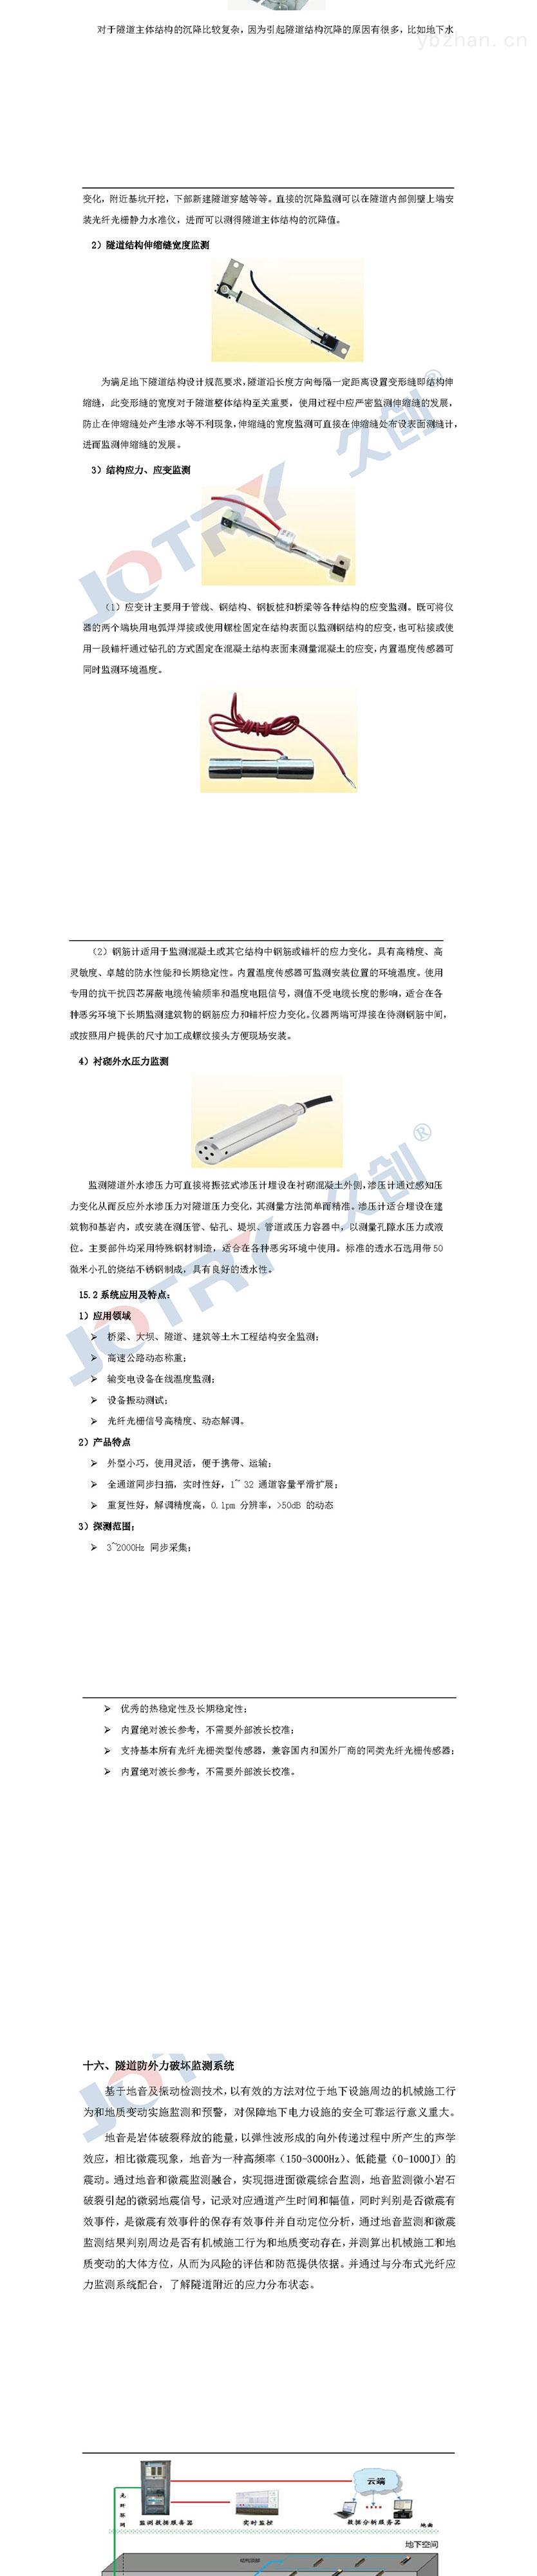 <strong>电缆隧道综合监控系统</strong>02-恢复的04_05.jpg